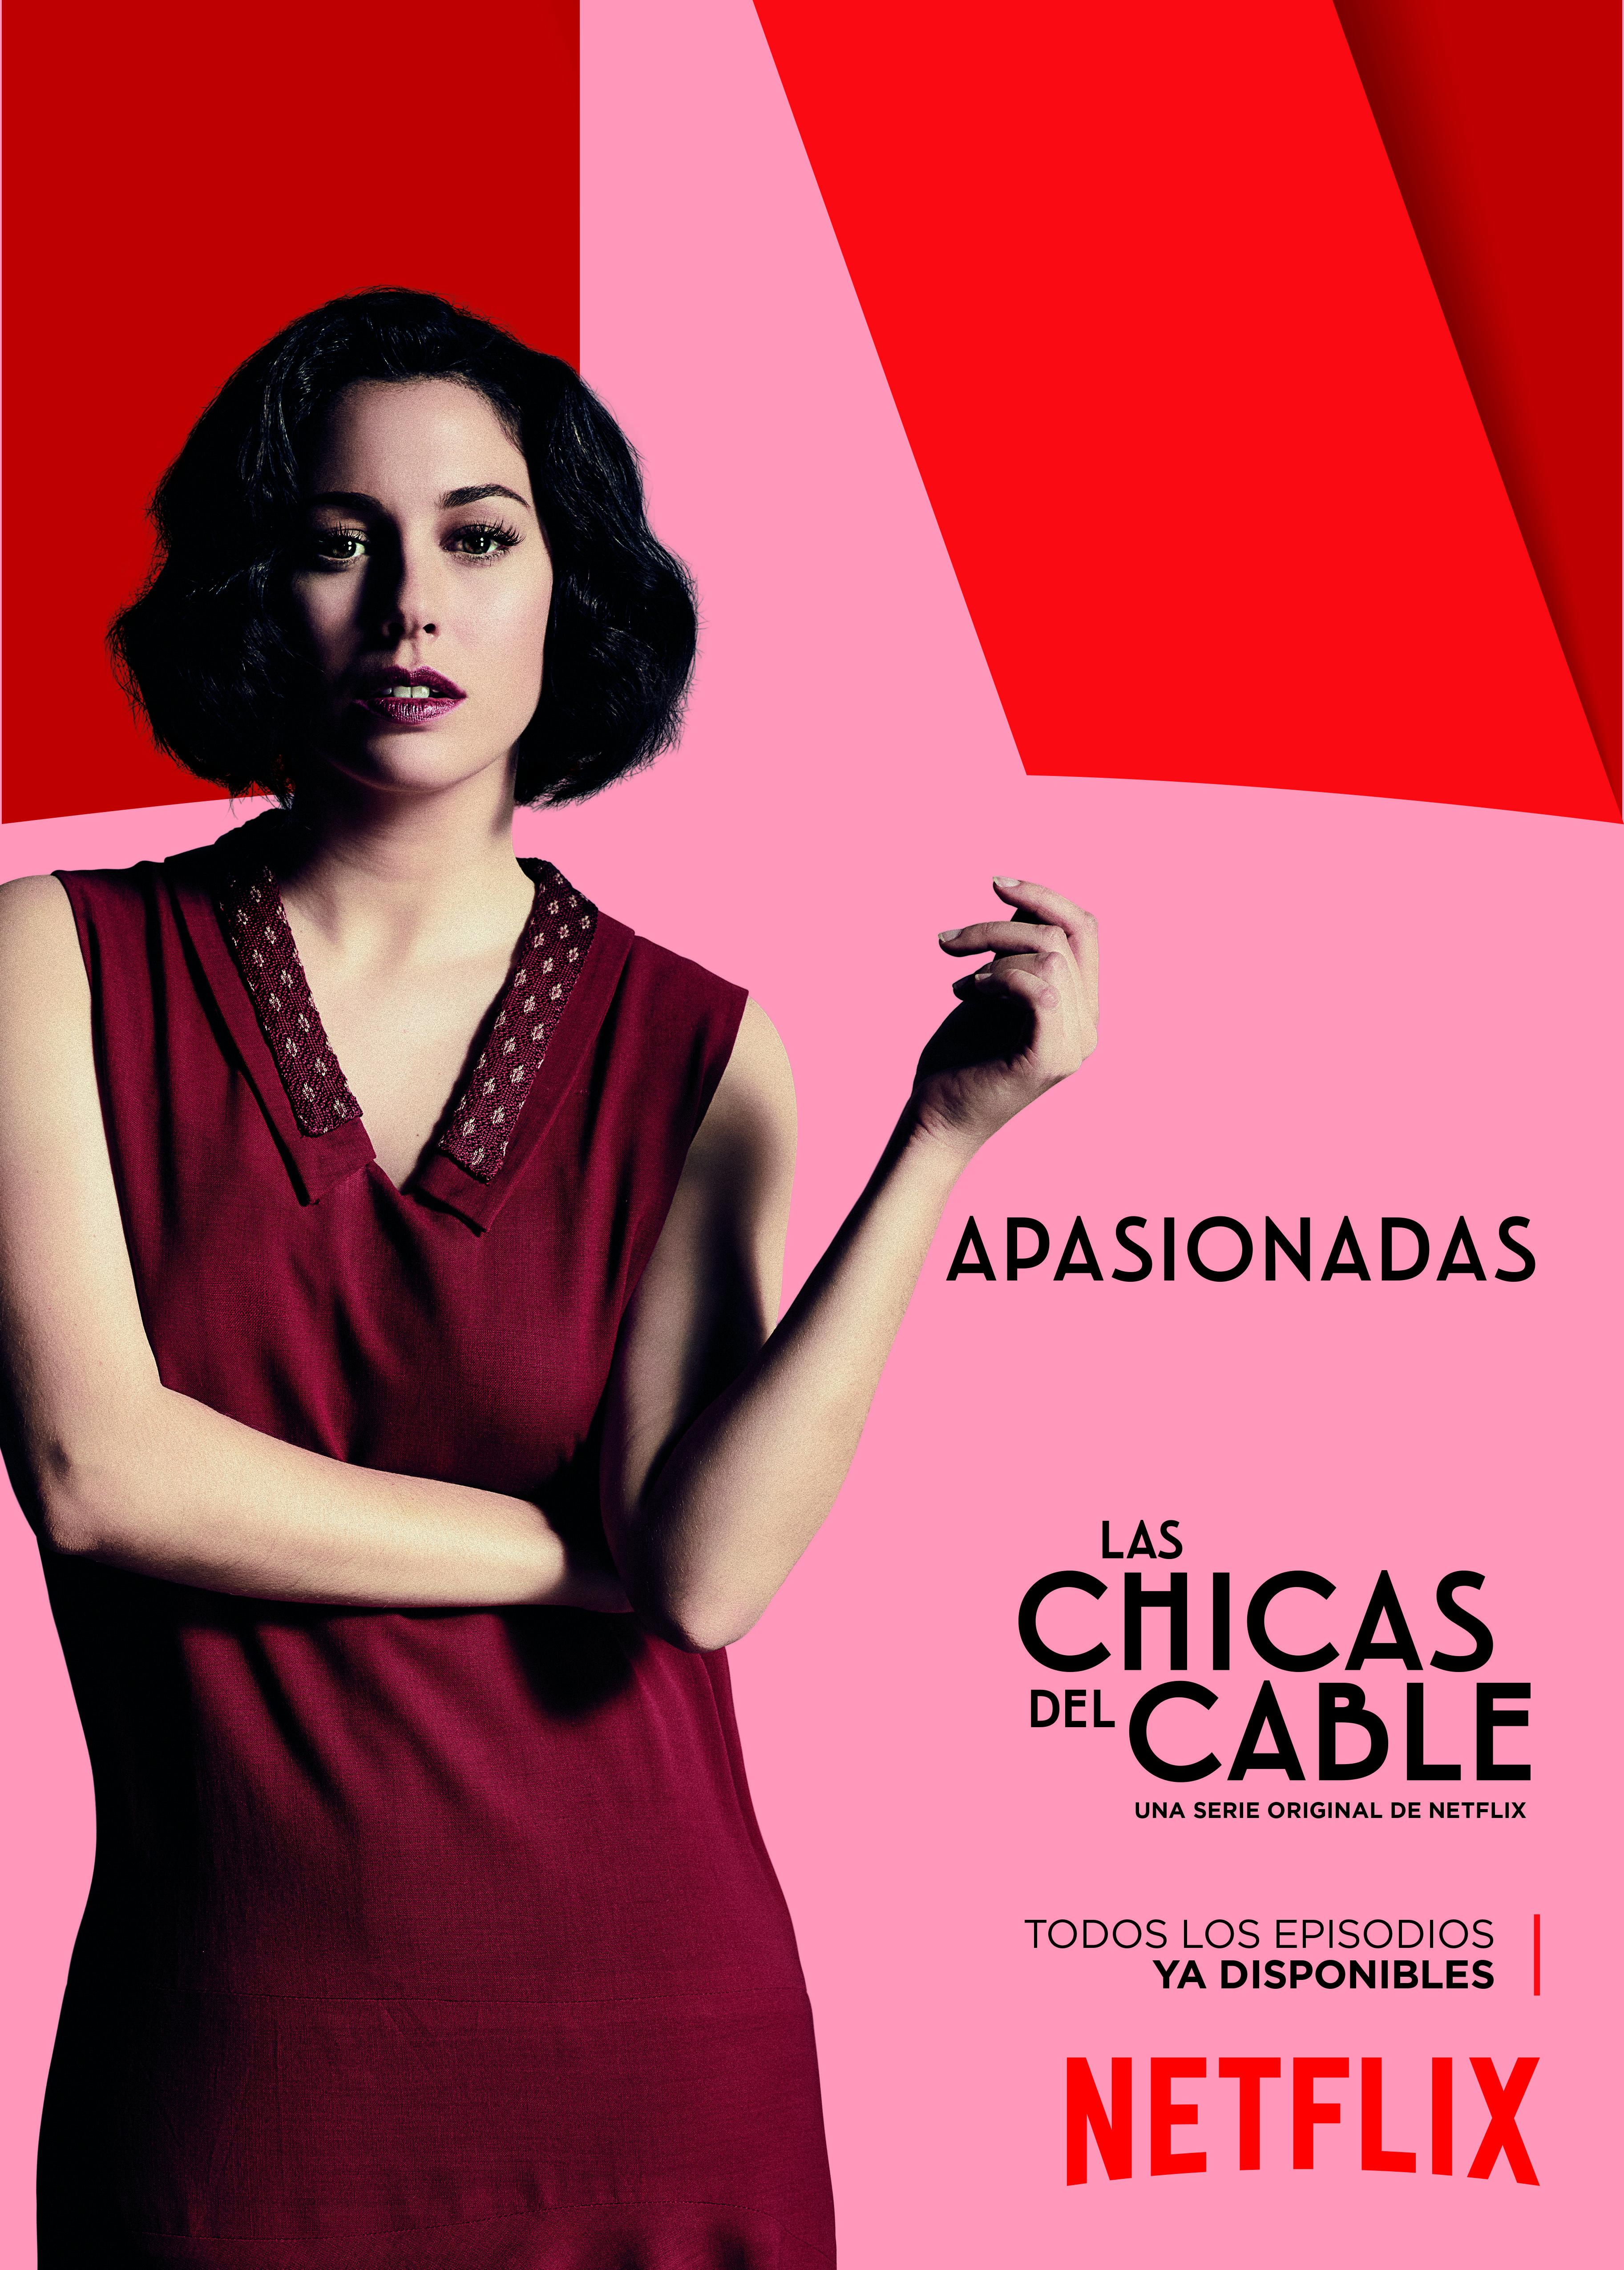 as_chicas_del_cable_Netflix_mondo_sonoro_Apasionadas_pegada_carteles